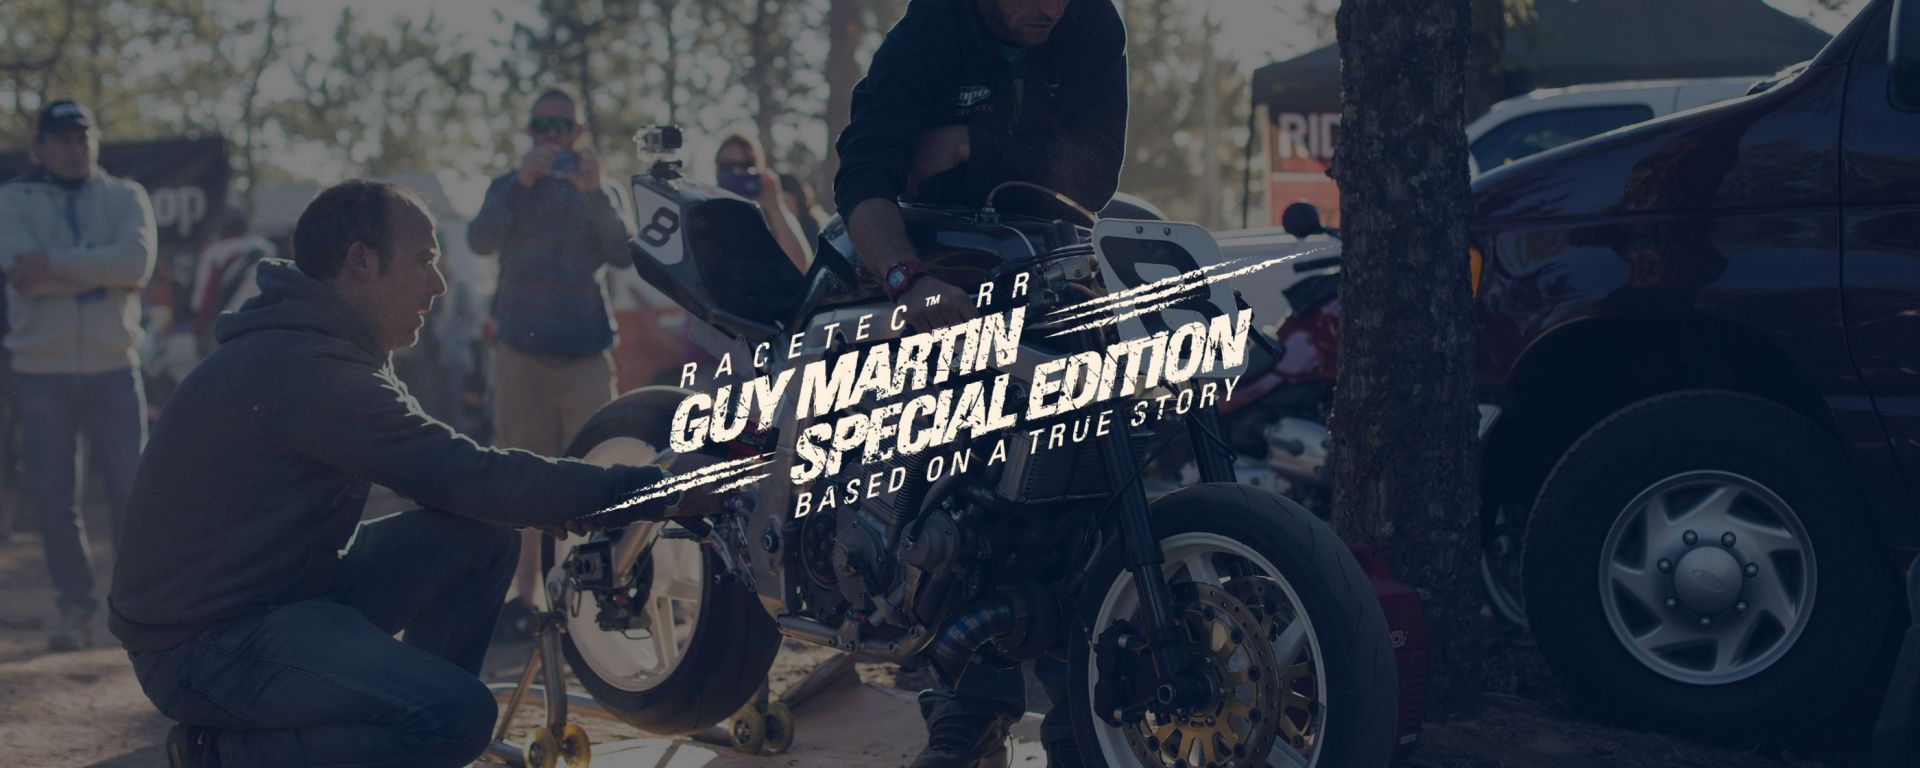 Metzeler Racetec RR Guy Martin Special Edition